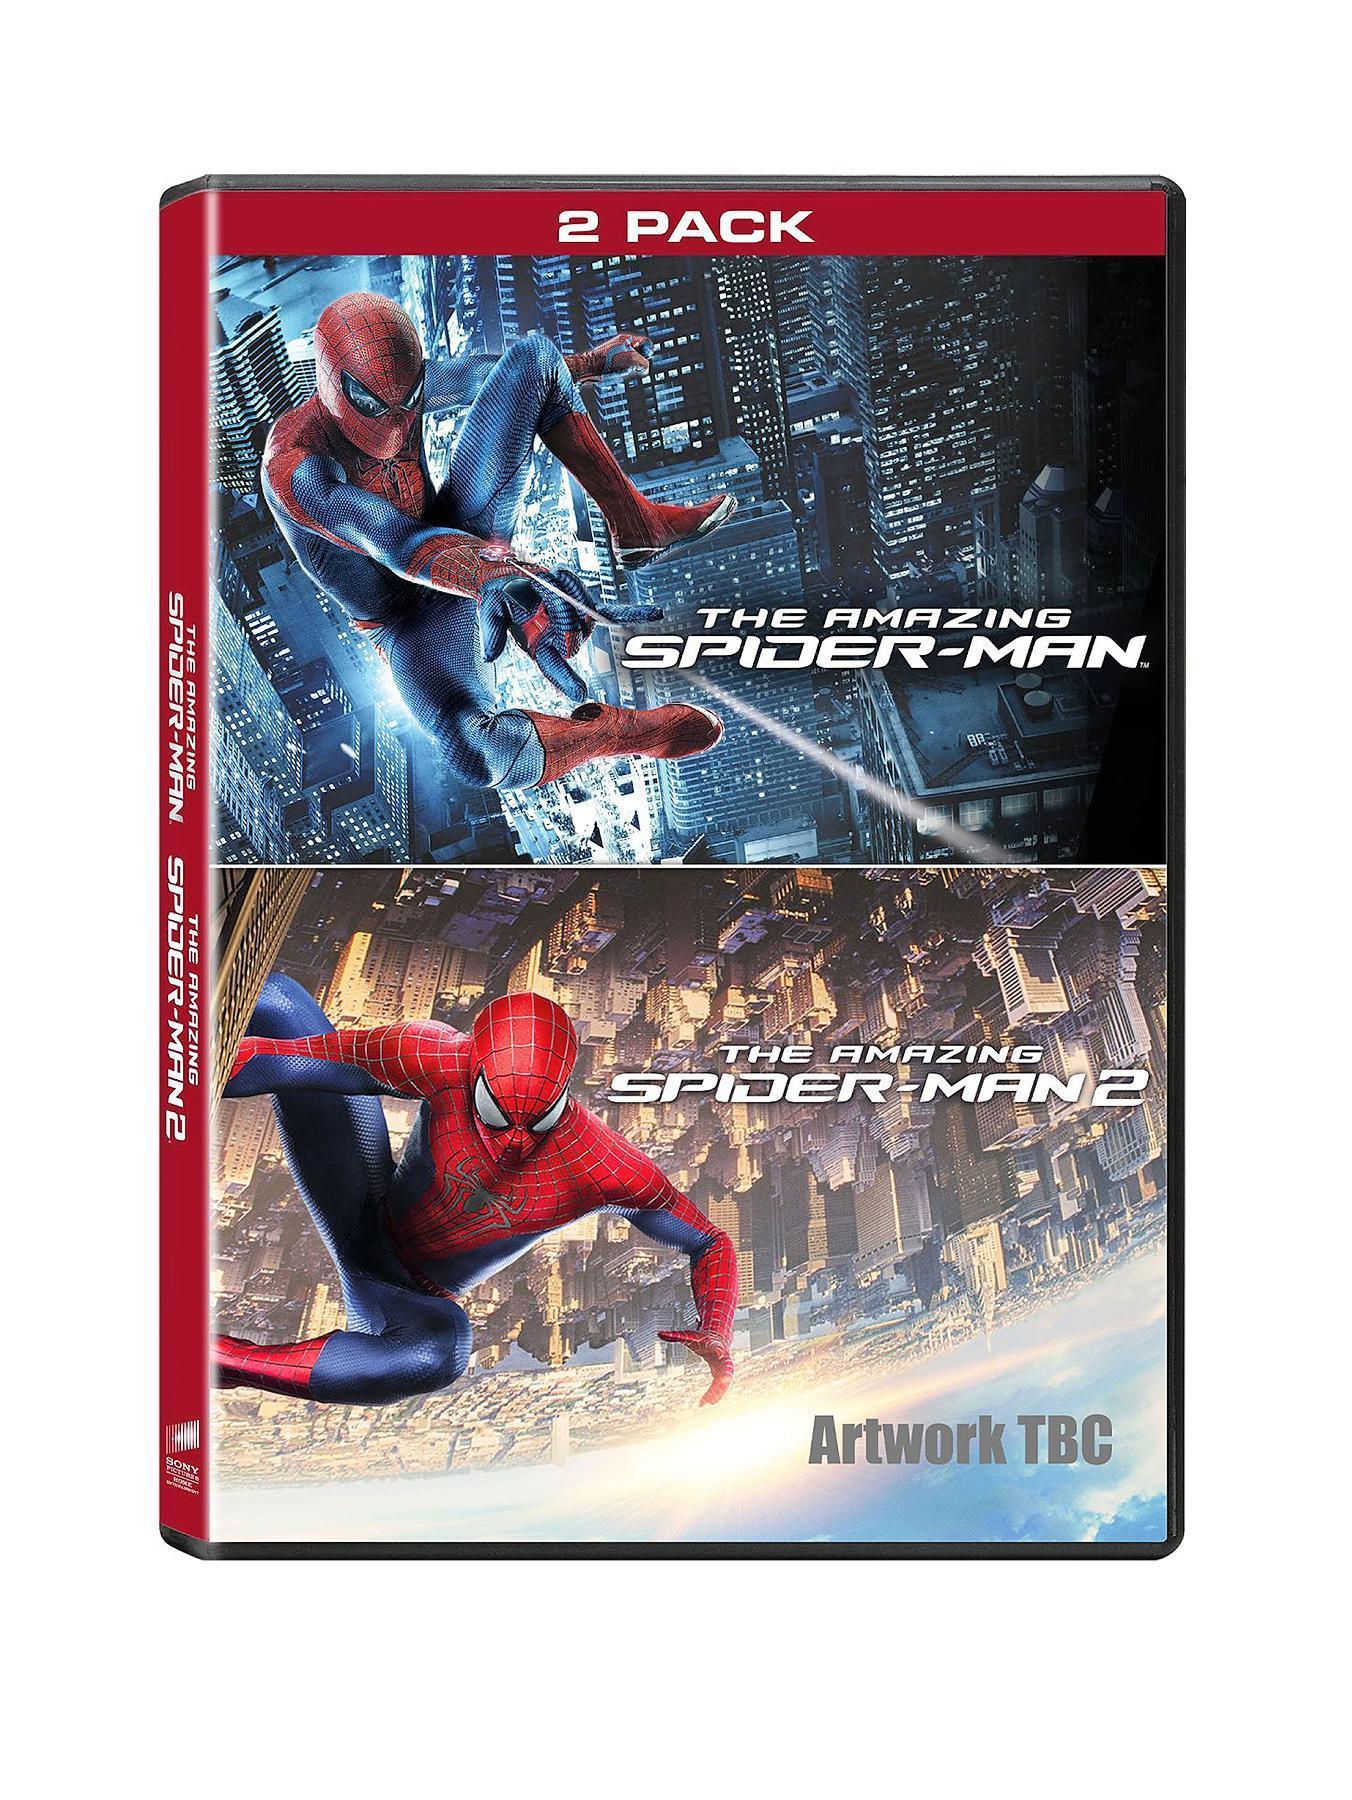 The Amazing Spider-Man 1-2 DVD